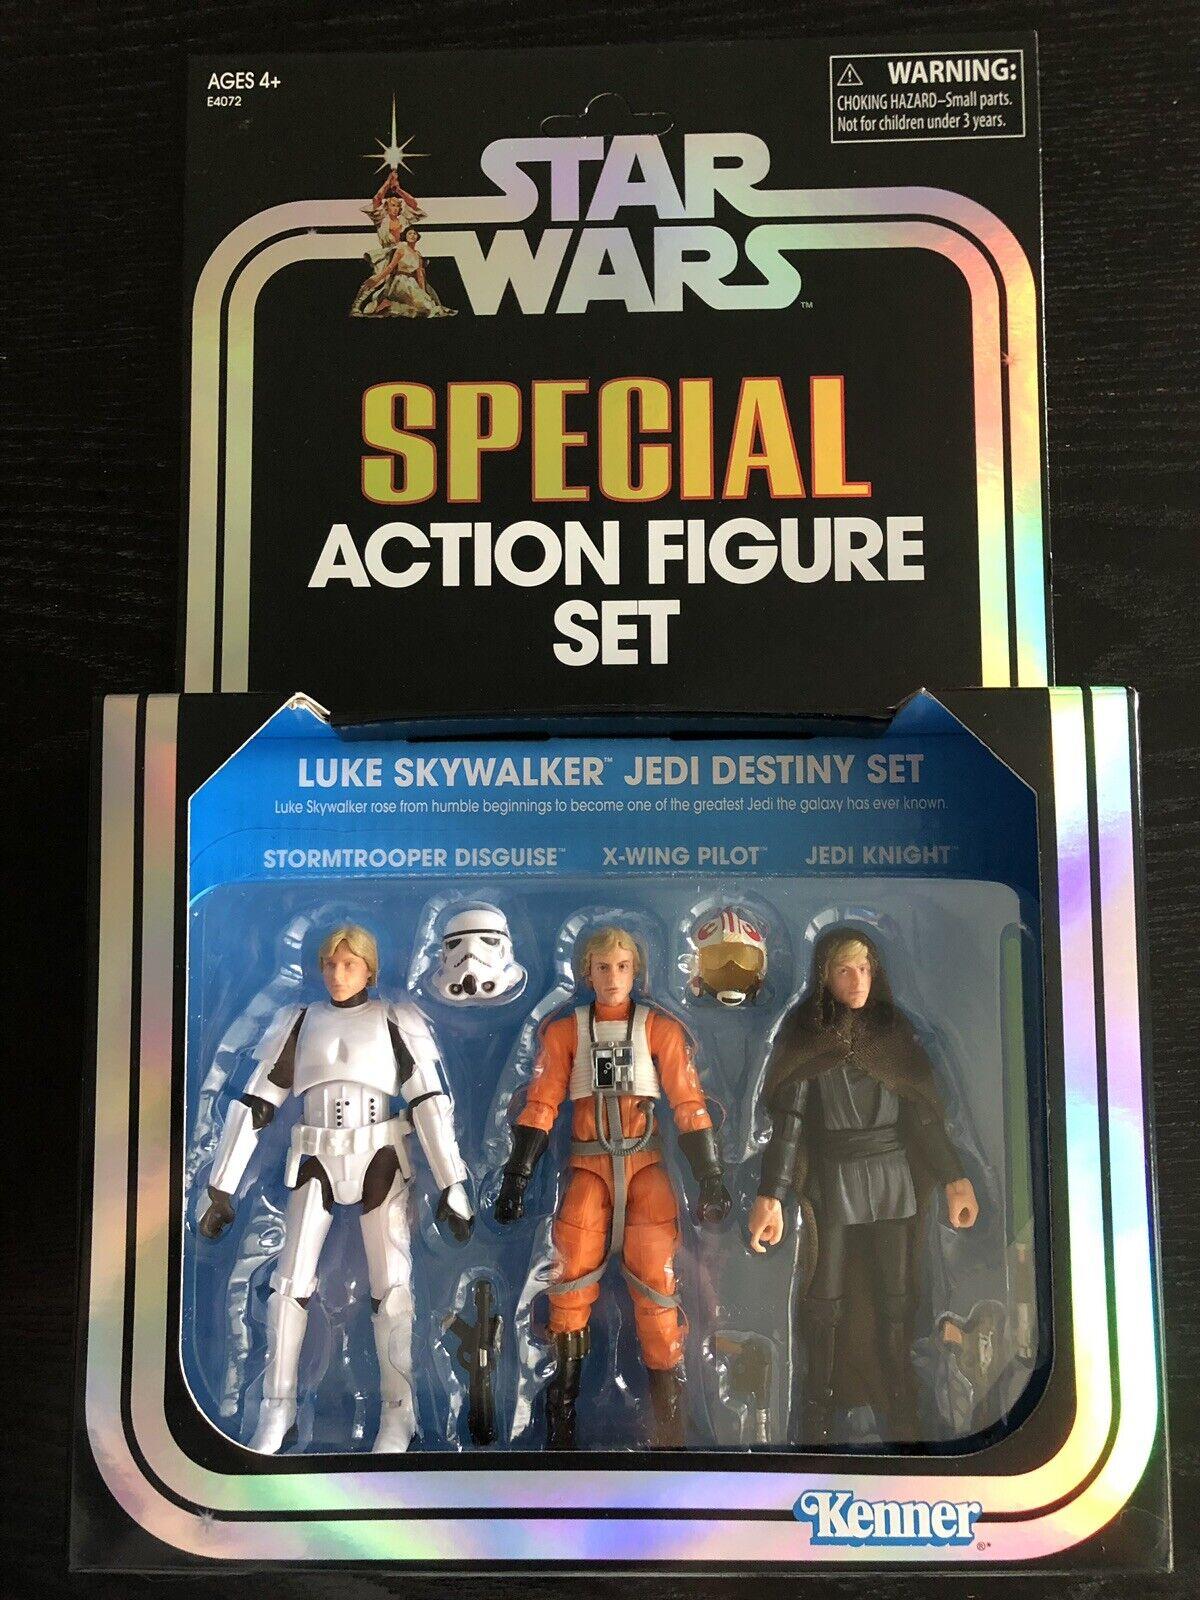 SDCC 2019 COMIC CON Hasbro estrella guerras Luke cielowalker Jedi Destiny 3 Set exclu